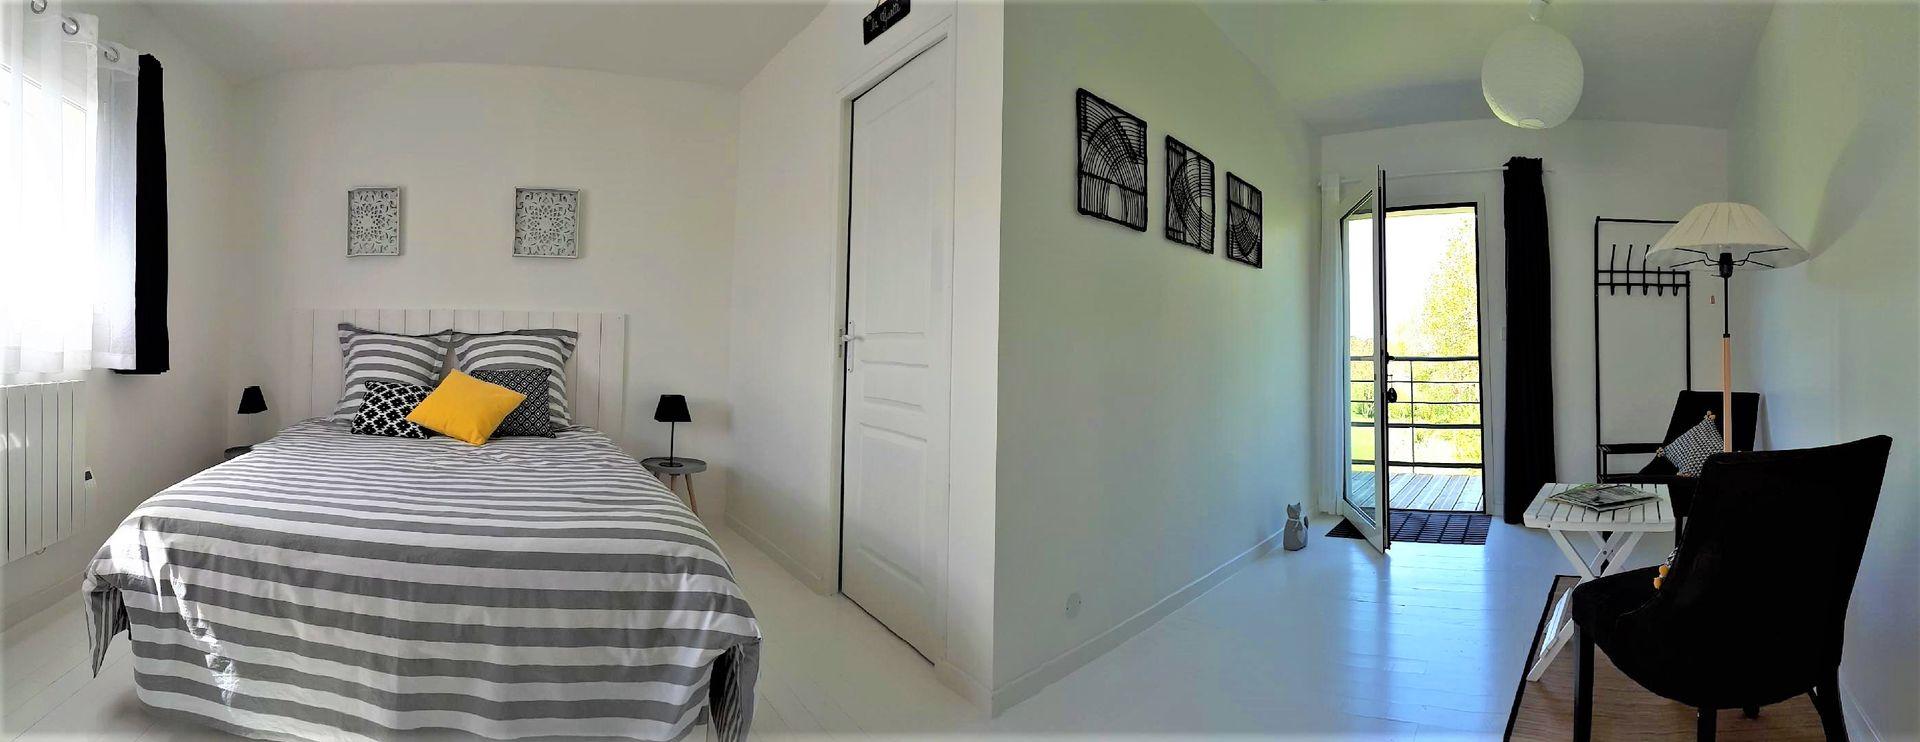 Chambres---La-Fontaine-de-Resnel---chambre-1---Frehel---2018